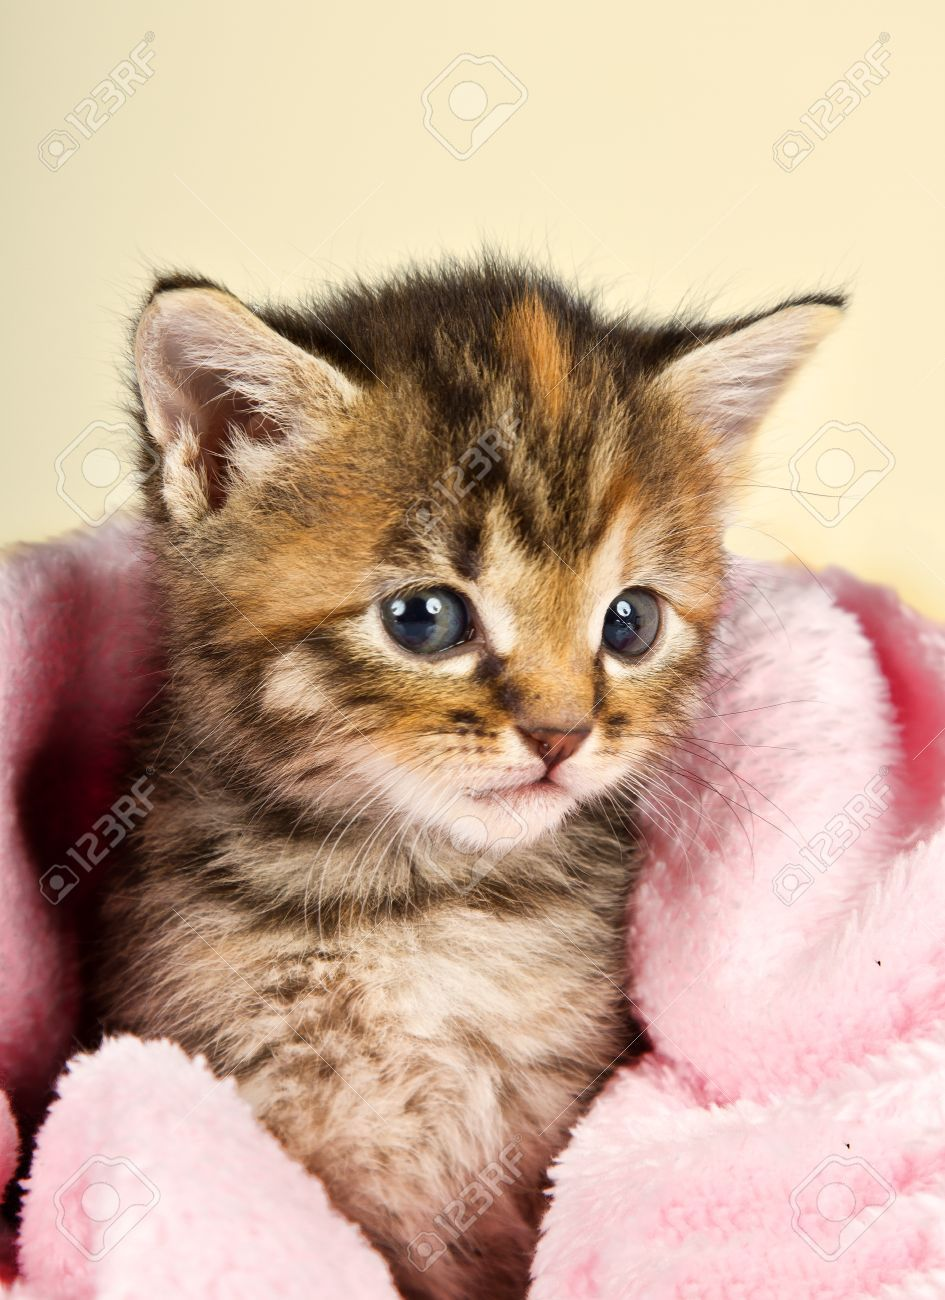 Curious Little Kitten In A Pink Blanket Looling So Cute Little Kittens Pink Blanket Kitten